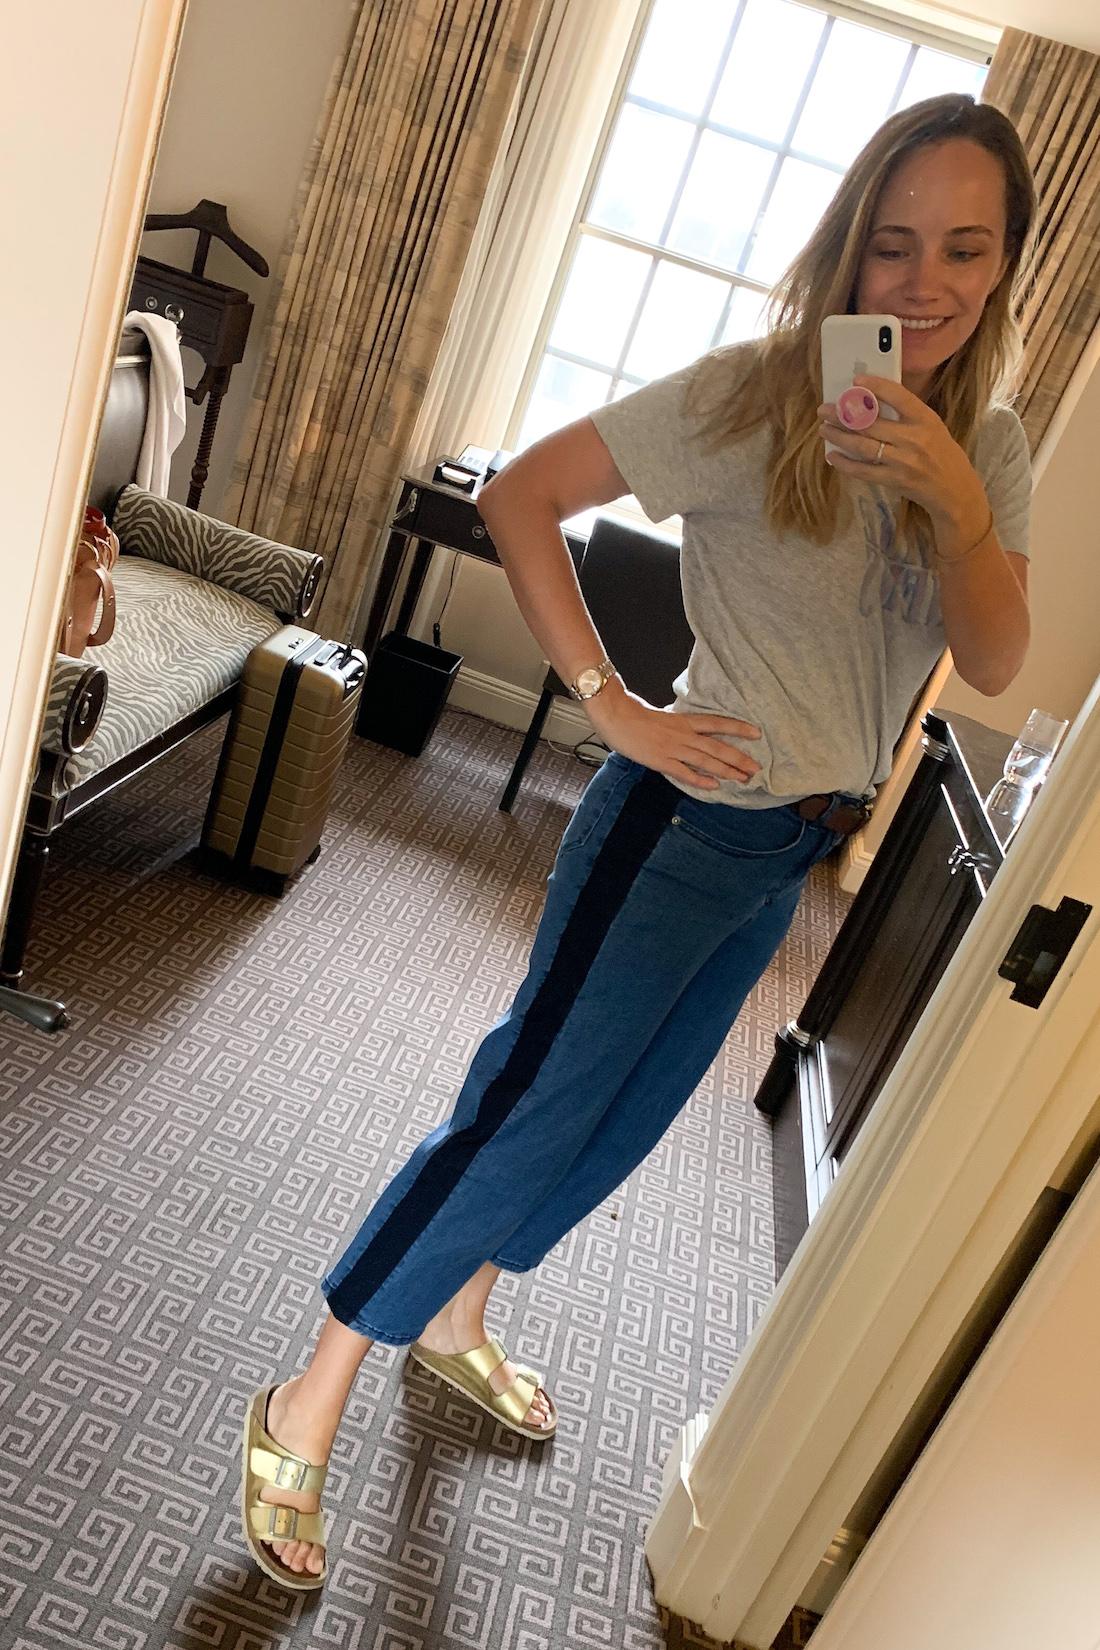 what I wore: IRO Fake News Tee // Universal Standard Side Stripe Jeans // J.Crew Belt (super old) // Gold Birkenstocks